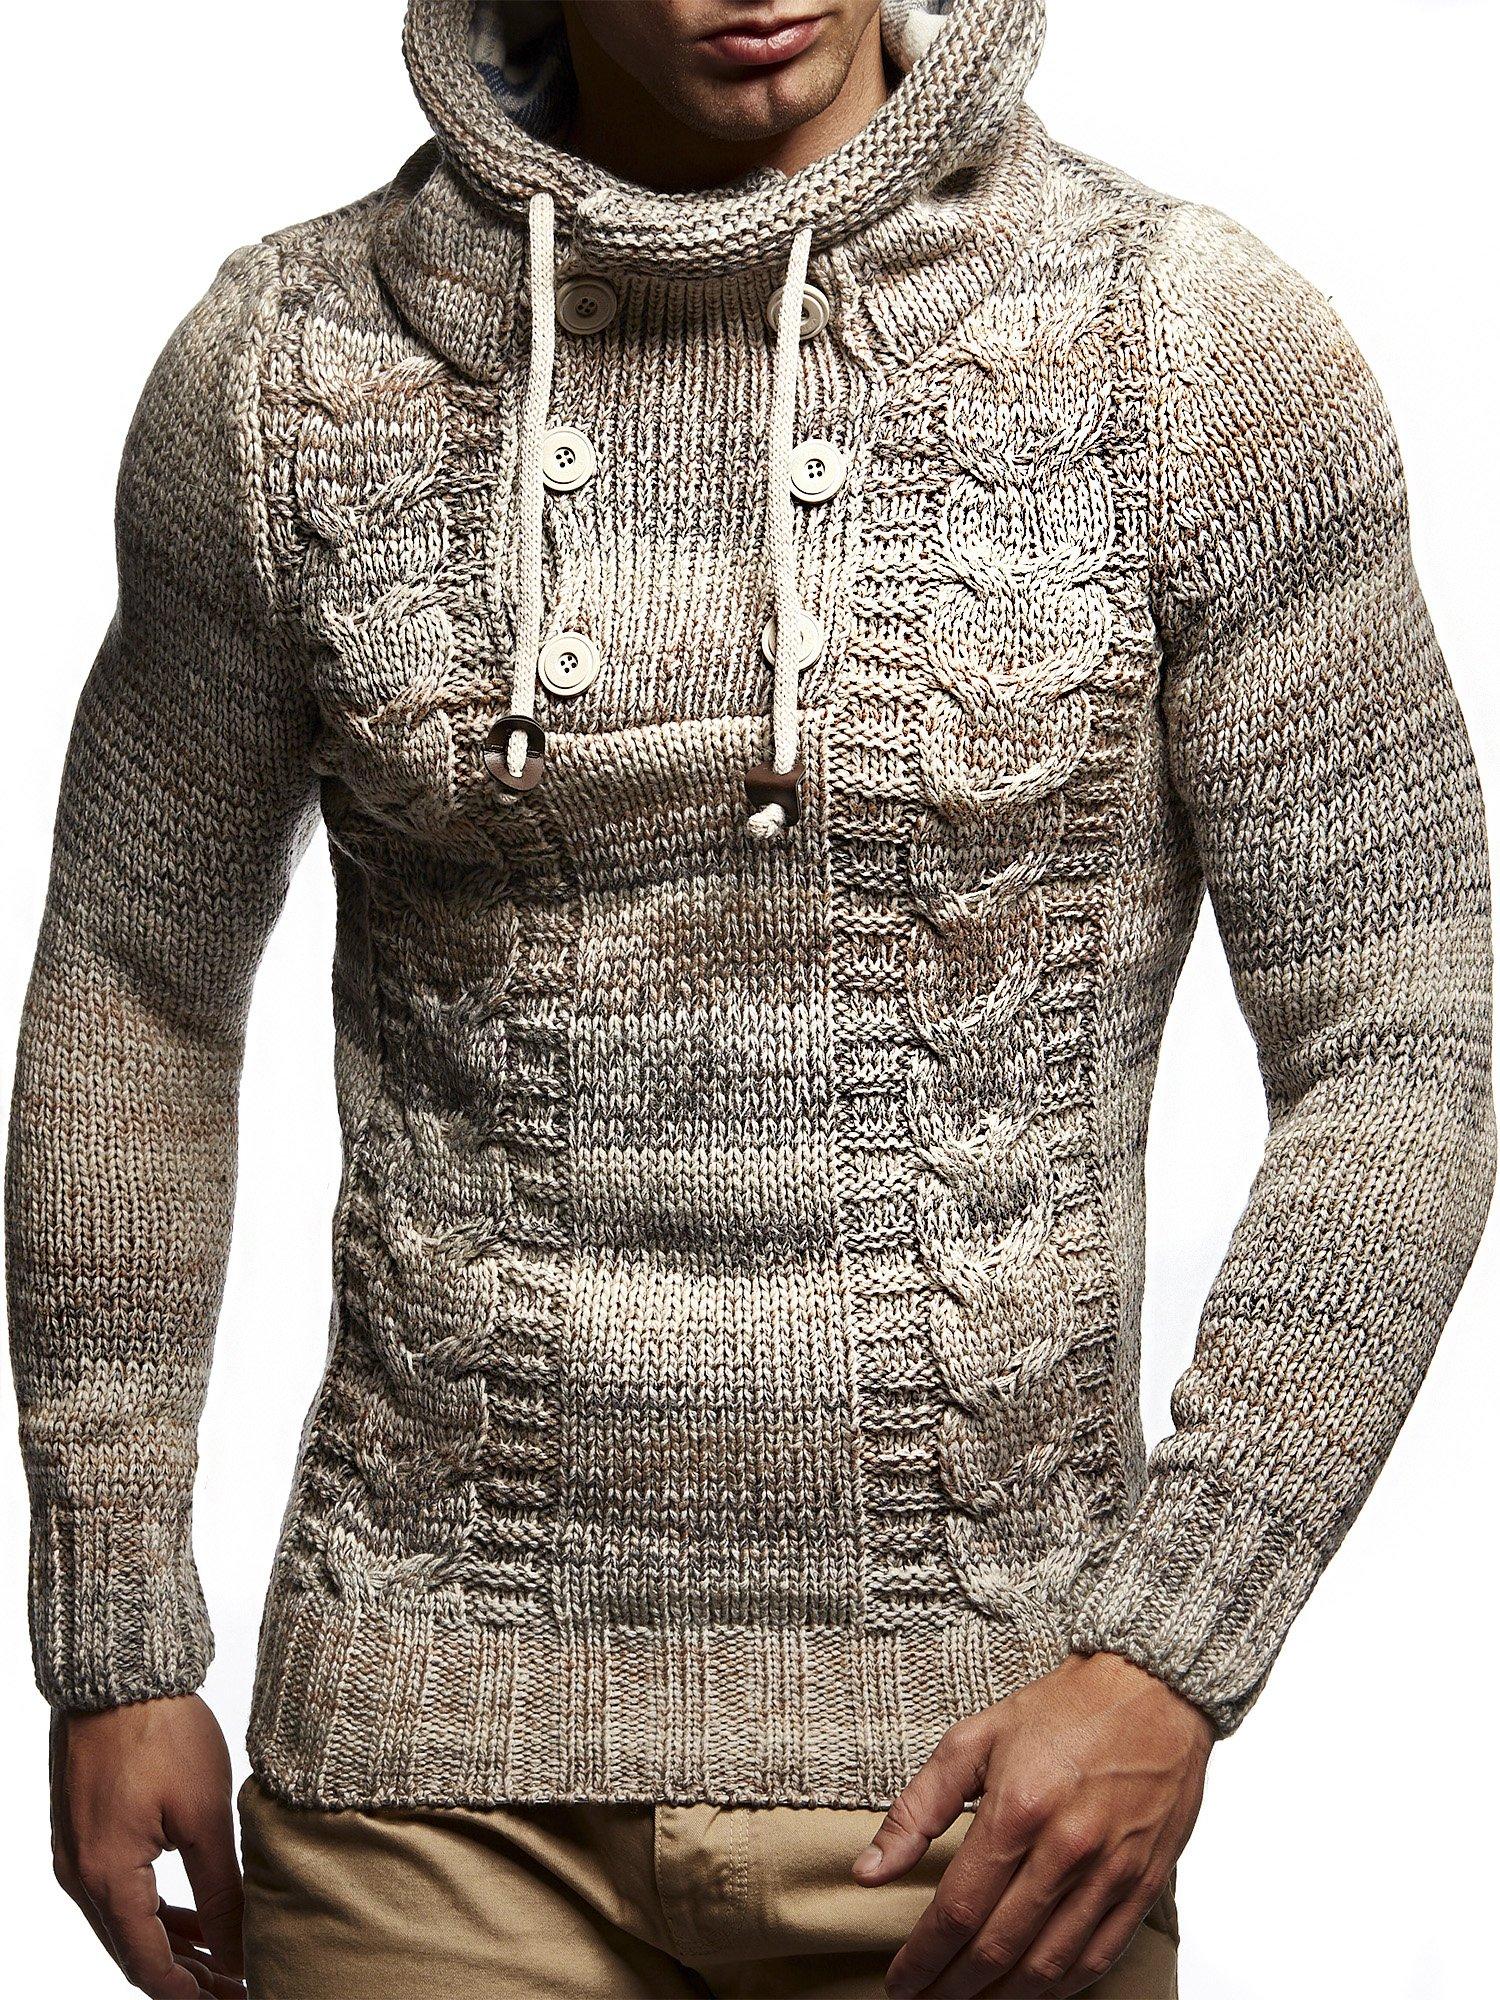 Leif Nelson LN20227 Men's Knitted Pullover,Beige,US-M / EU-L